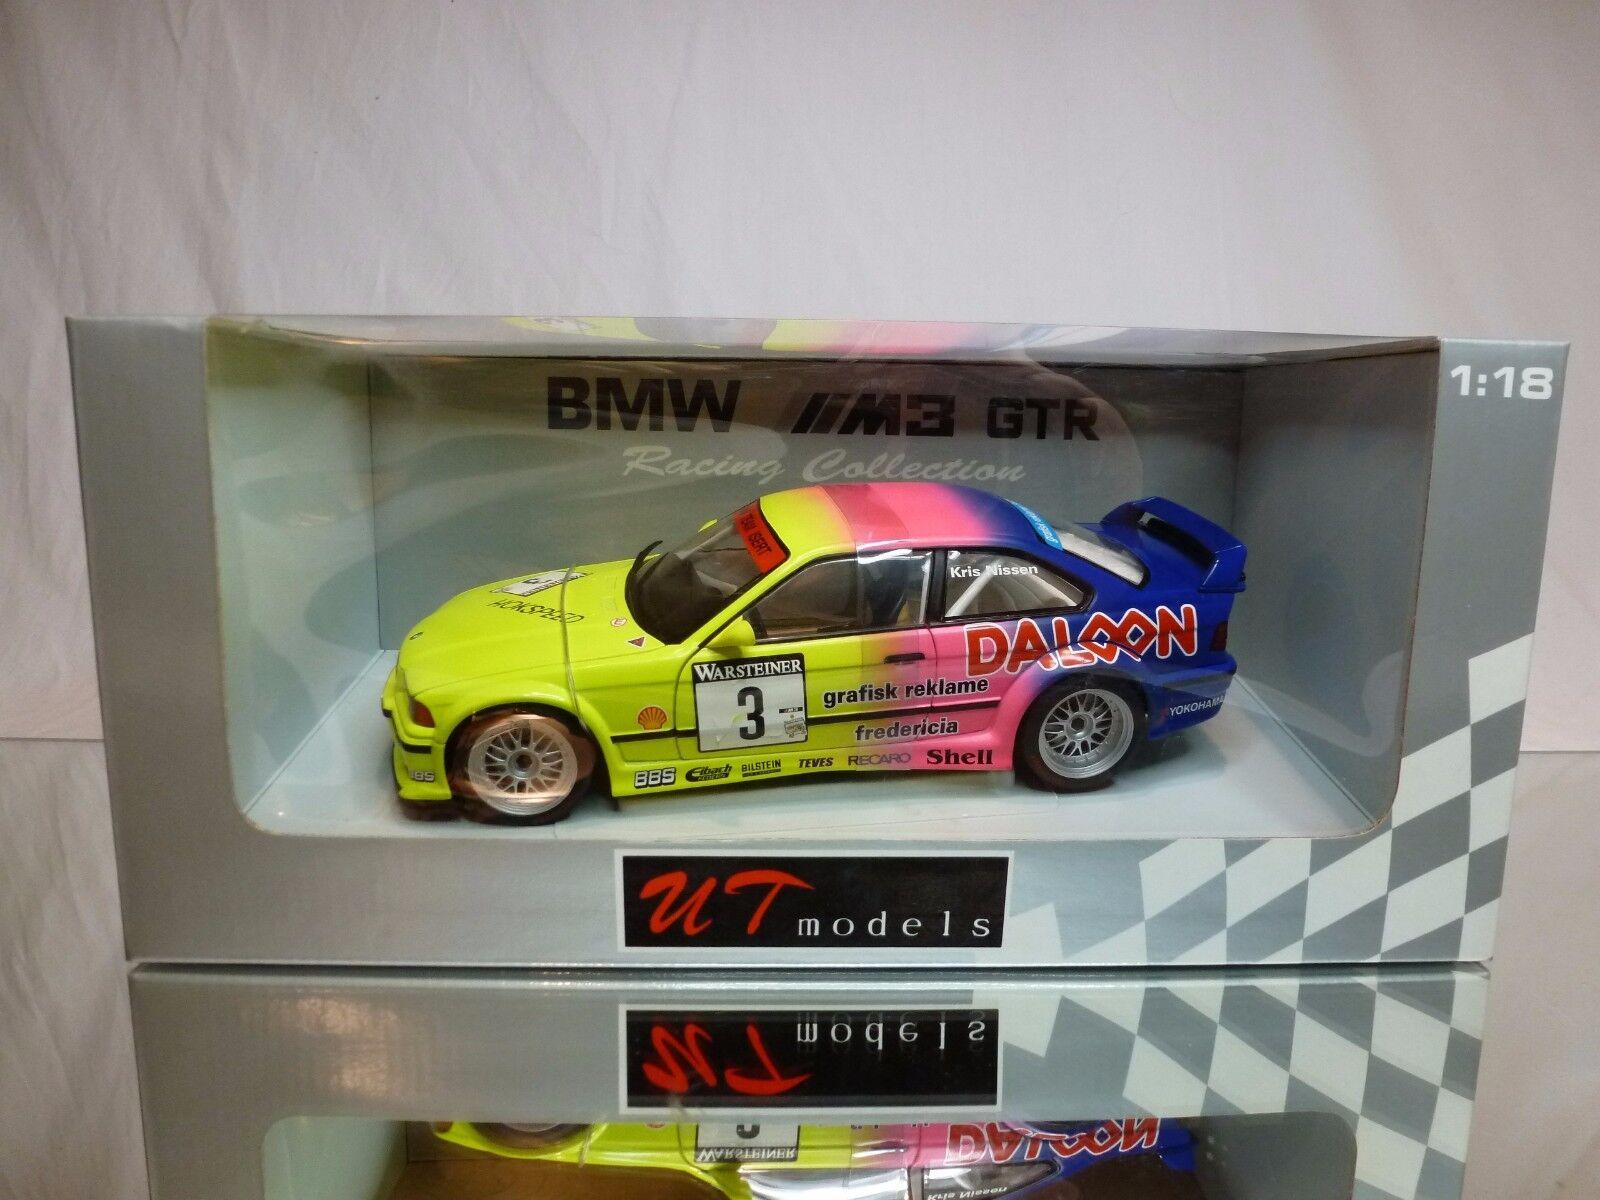 UT MODELS 39371 BMW M3 E36 GTR 1993 DALOON 1 18 - BOXED + TRANSPORT STRAPS CAR